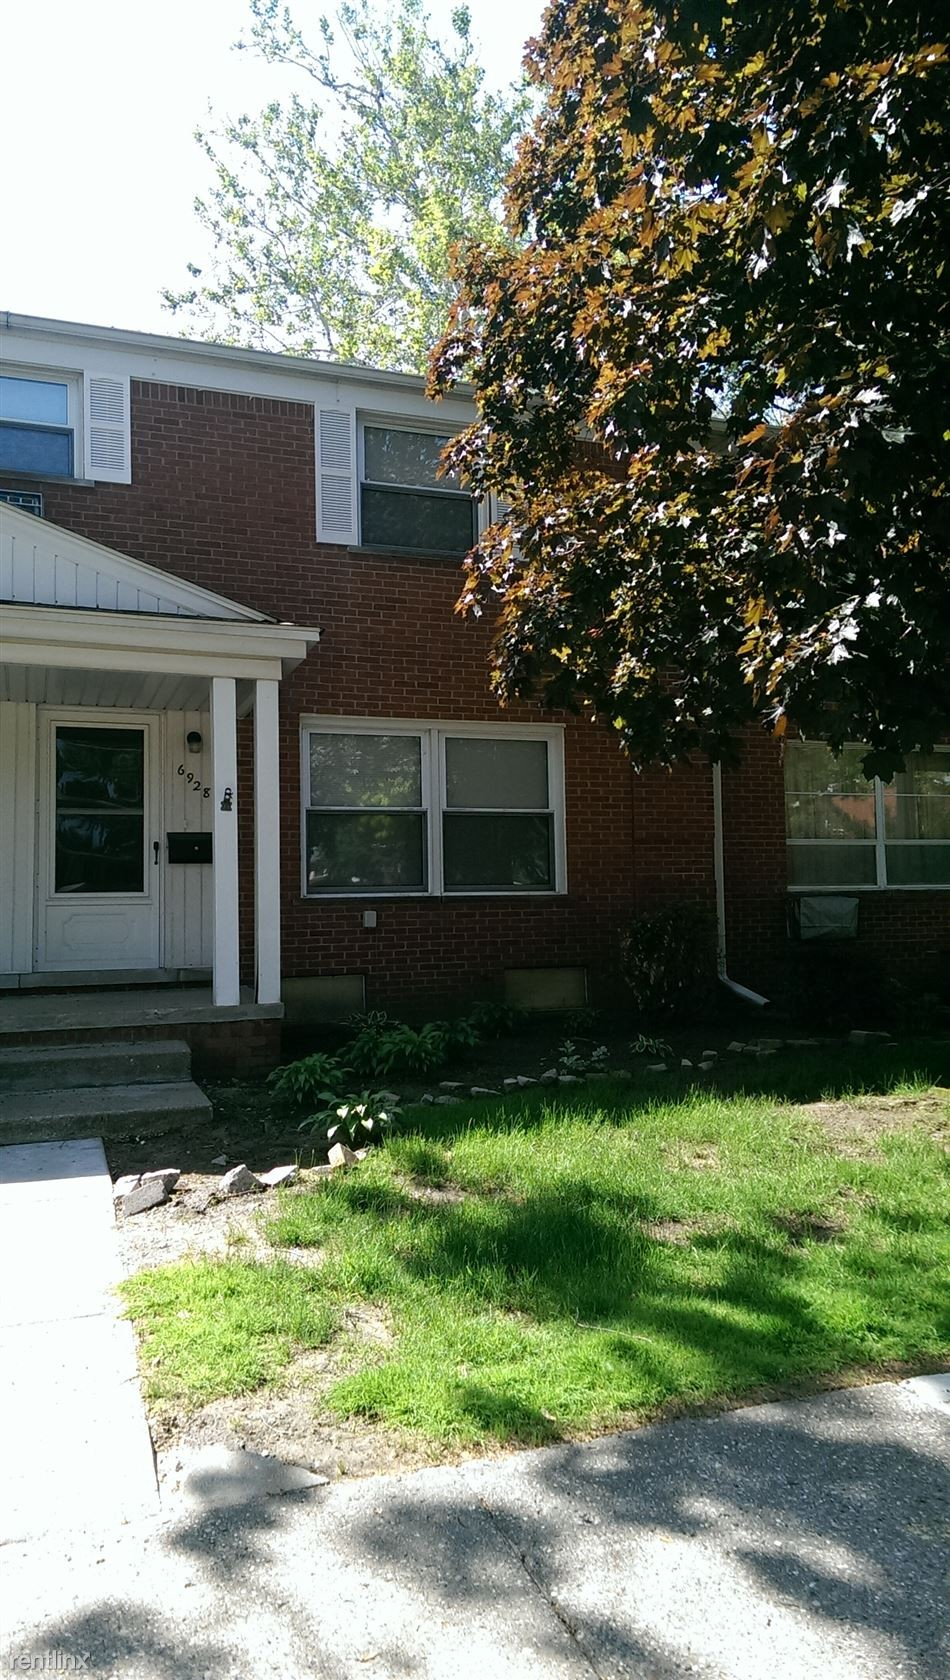 7368 Fielding St Detroit Mi 48228 3 Bedroom Apartment For Rent Padmapper